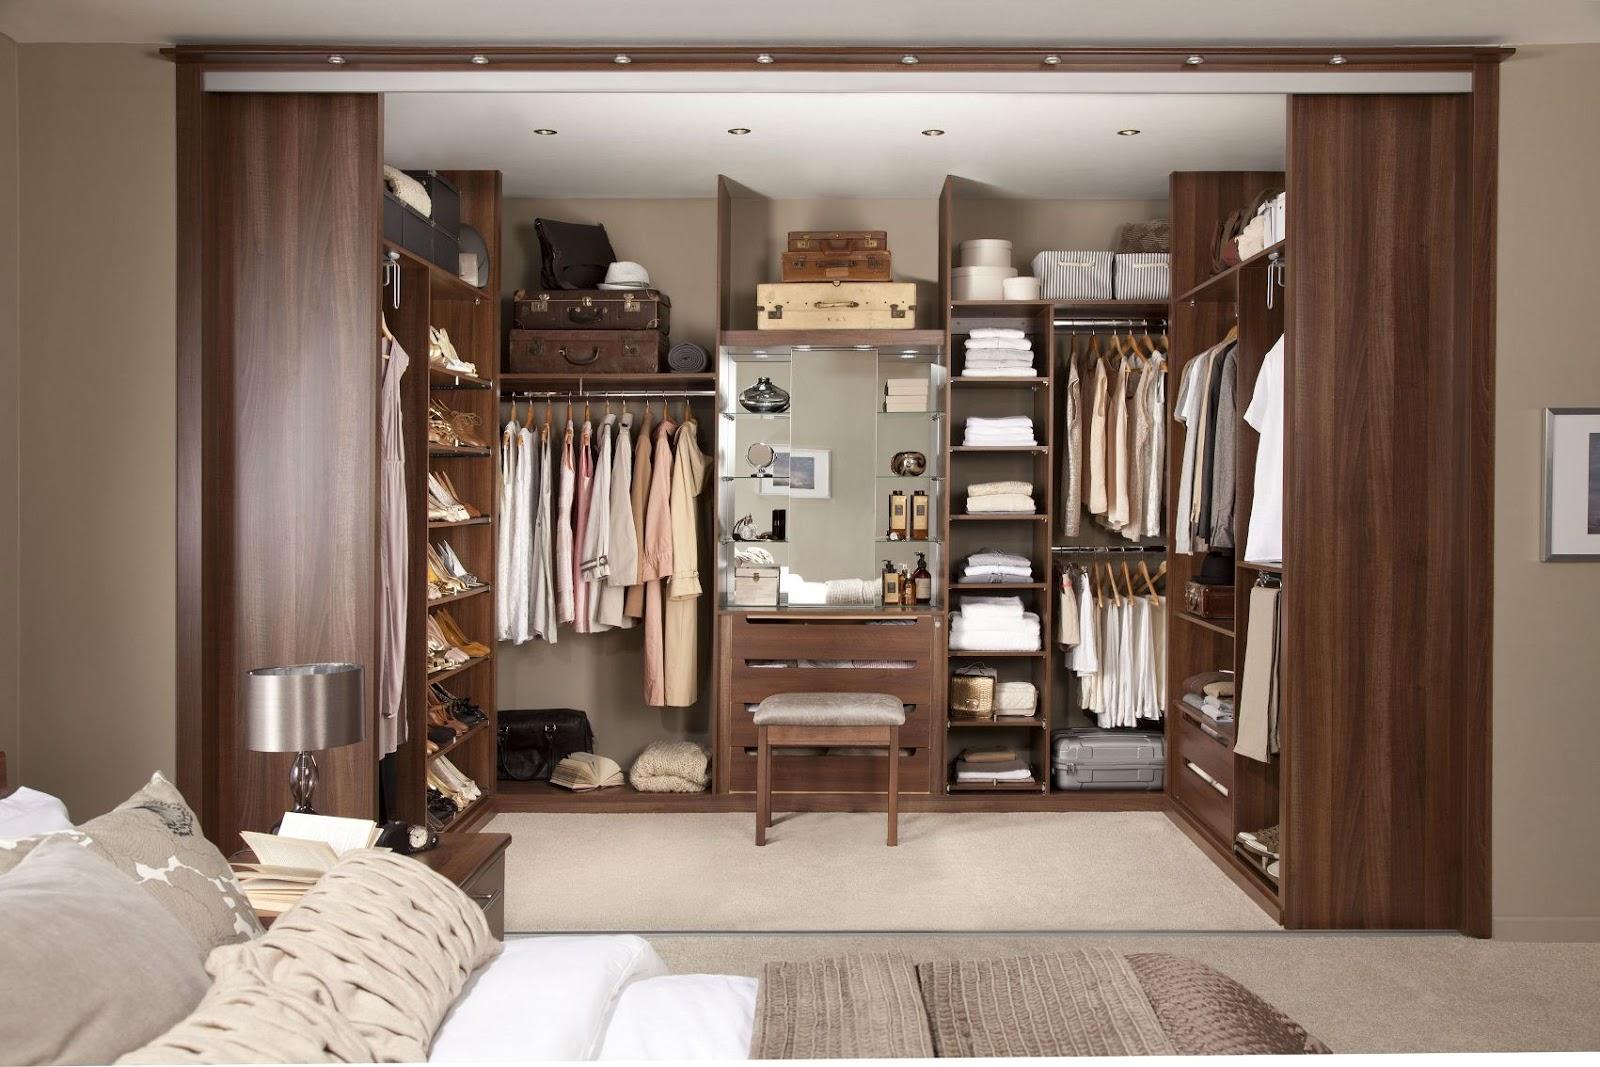 FARISDECOR: Magnifique chambre dressing تصميم غرفة ملابس رائعة